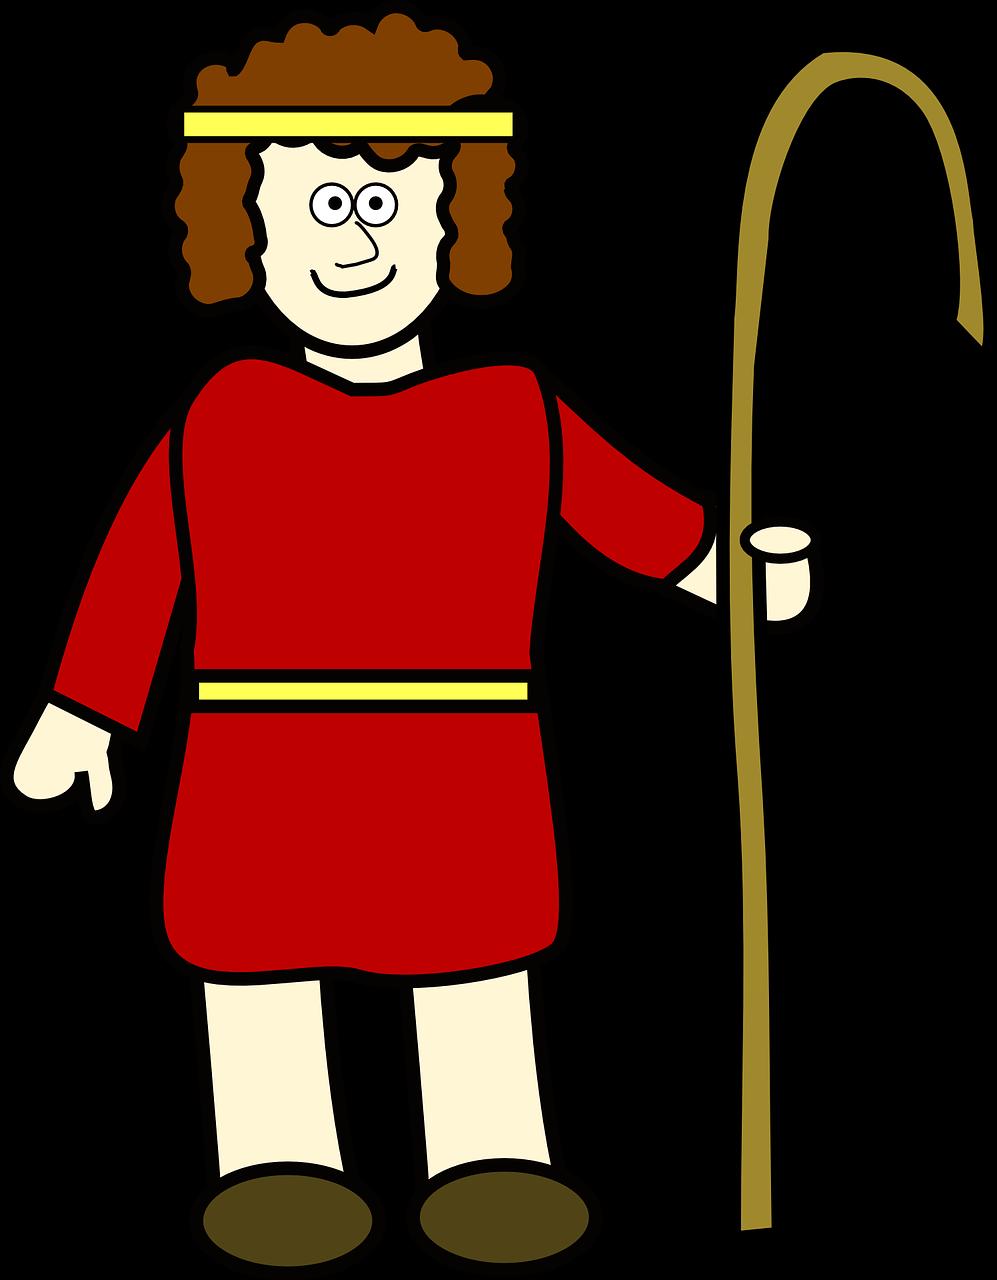 clipart freeuse download David man bible red. Shepherd clipart innkeep.